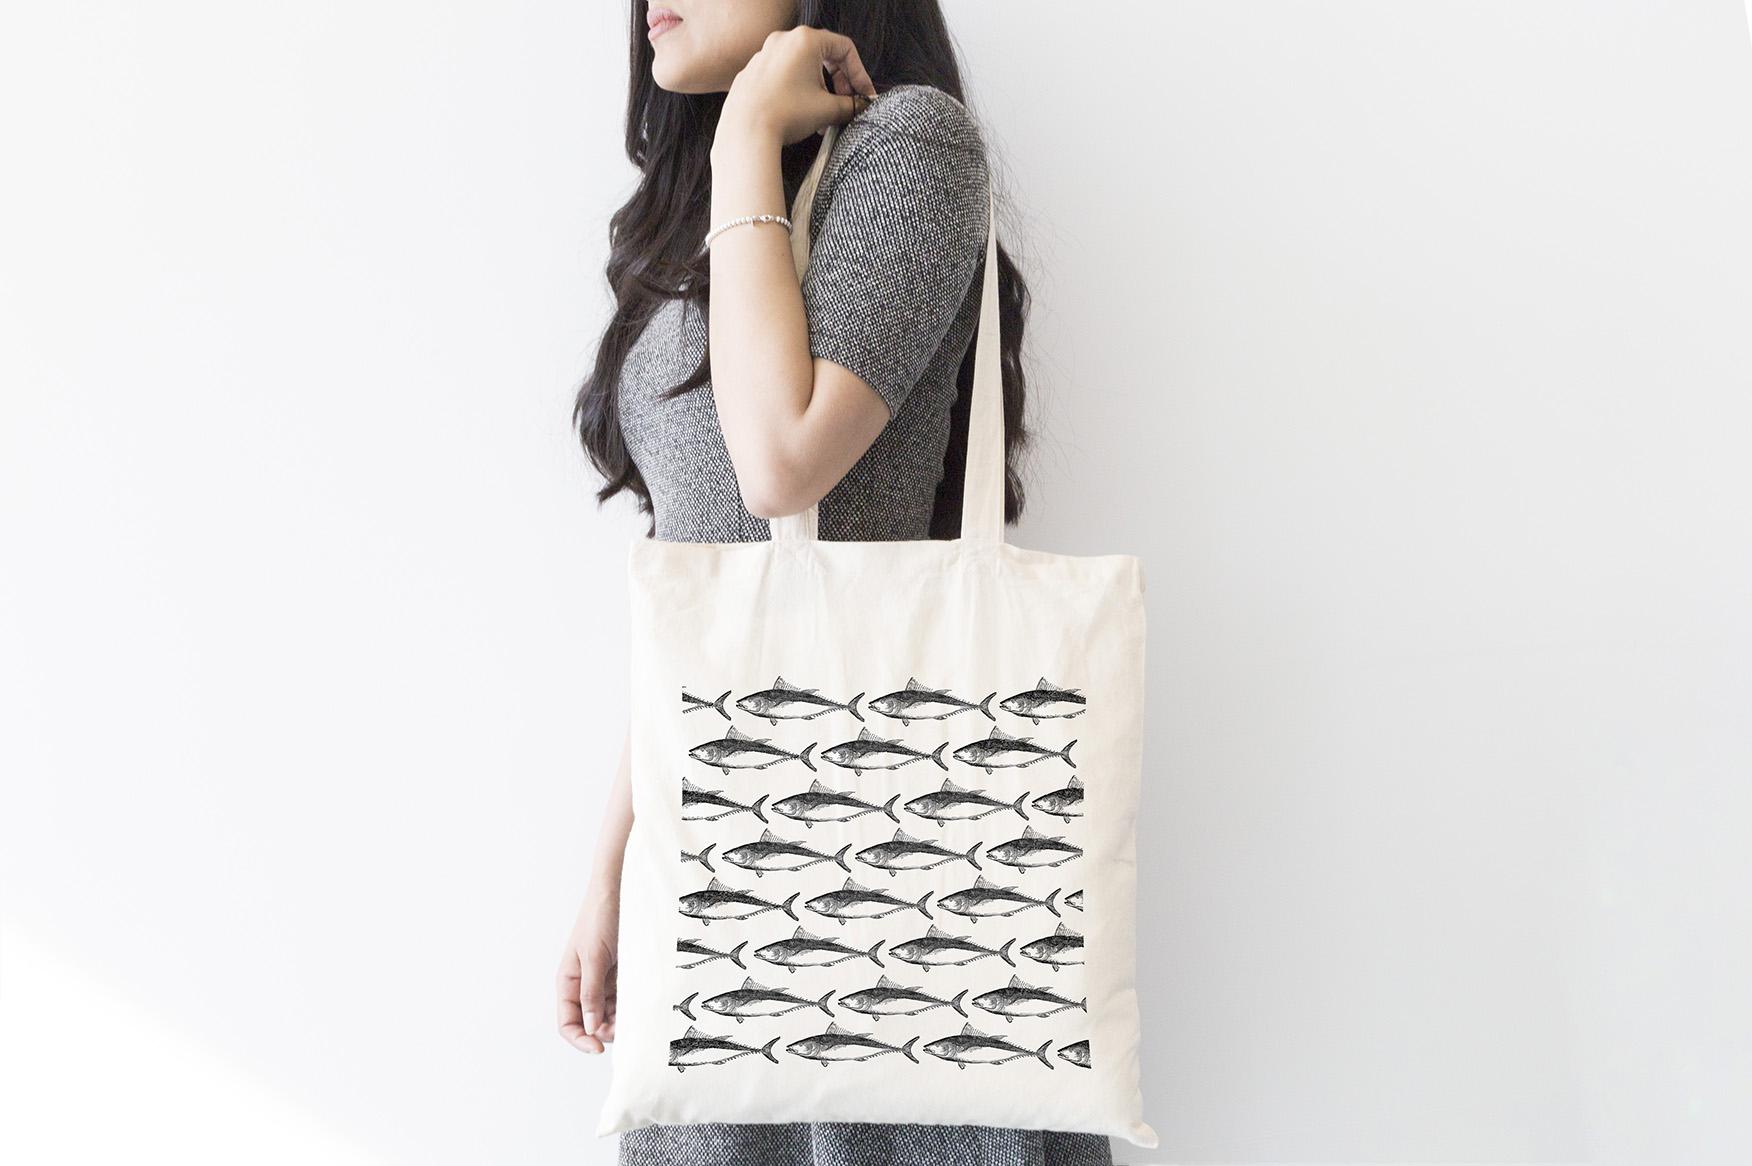 INT9369 Plastic Free July_Tote Bag-Designs_tuna FA2